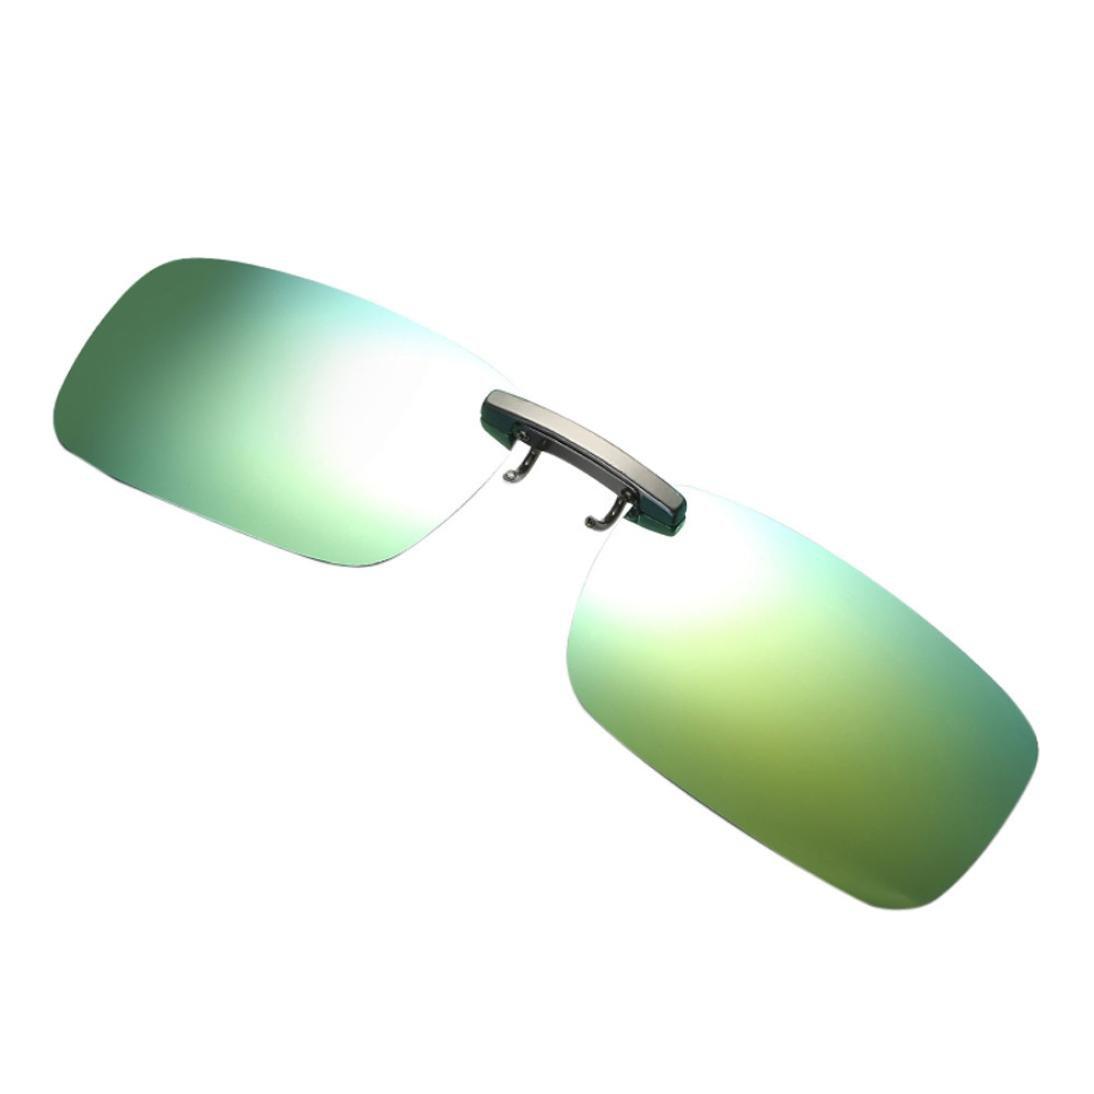 HOMEBABY Unisex Metal Polarized Clip On Glasses Sunglasses- Detachable Night Vision Lens Driving Vintage Sunglasses for Men Women Aviator Sun Glasses Sunglasses Blue)